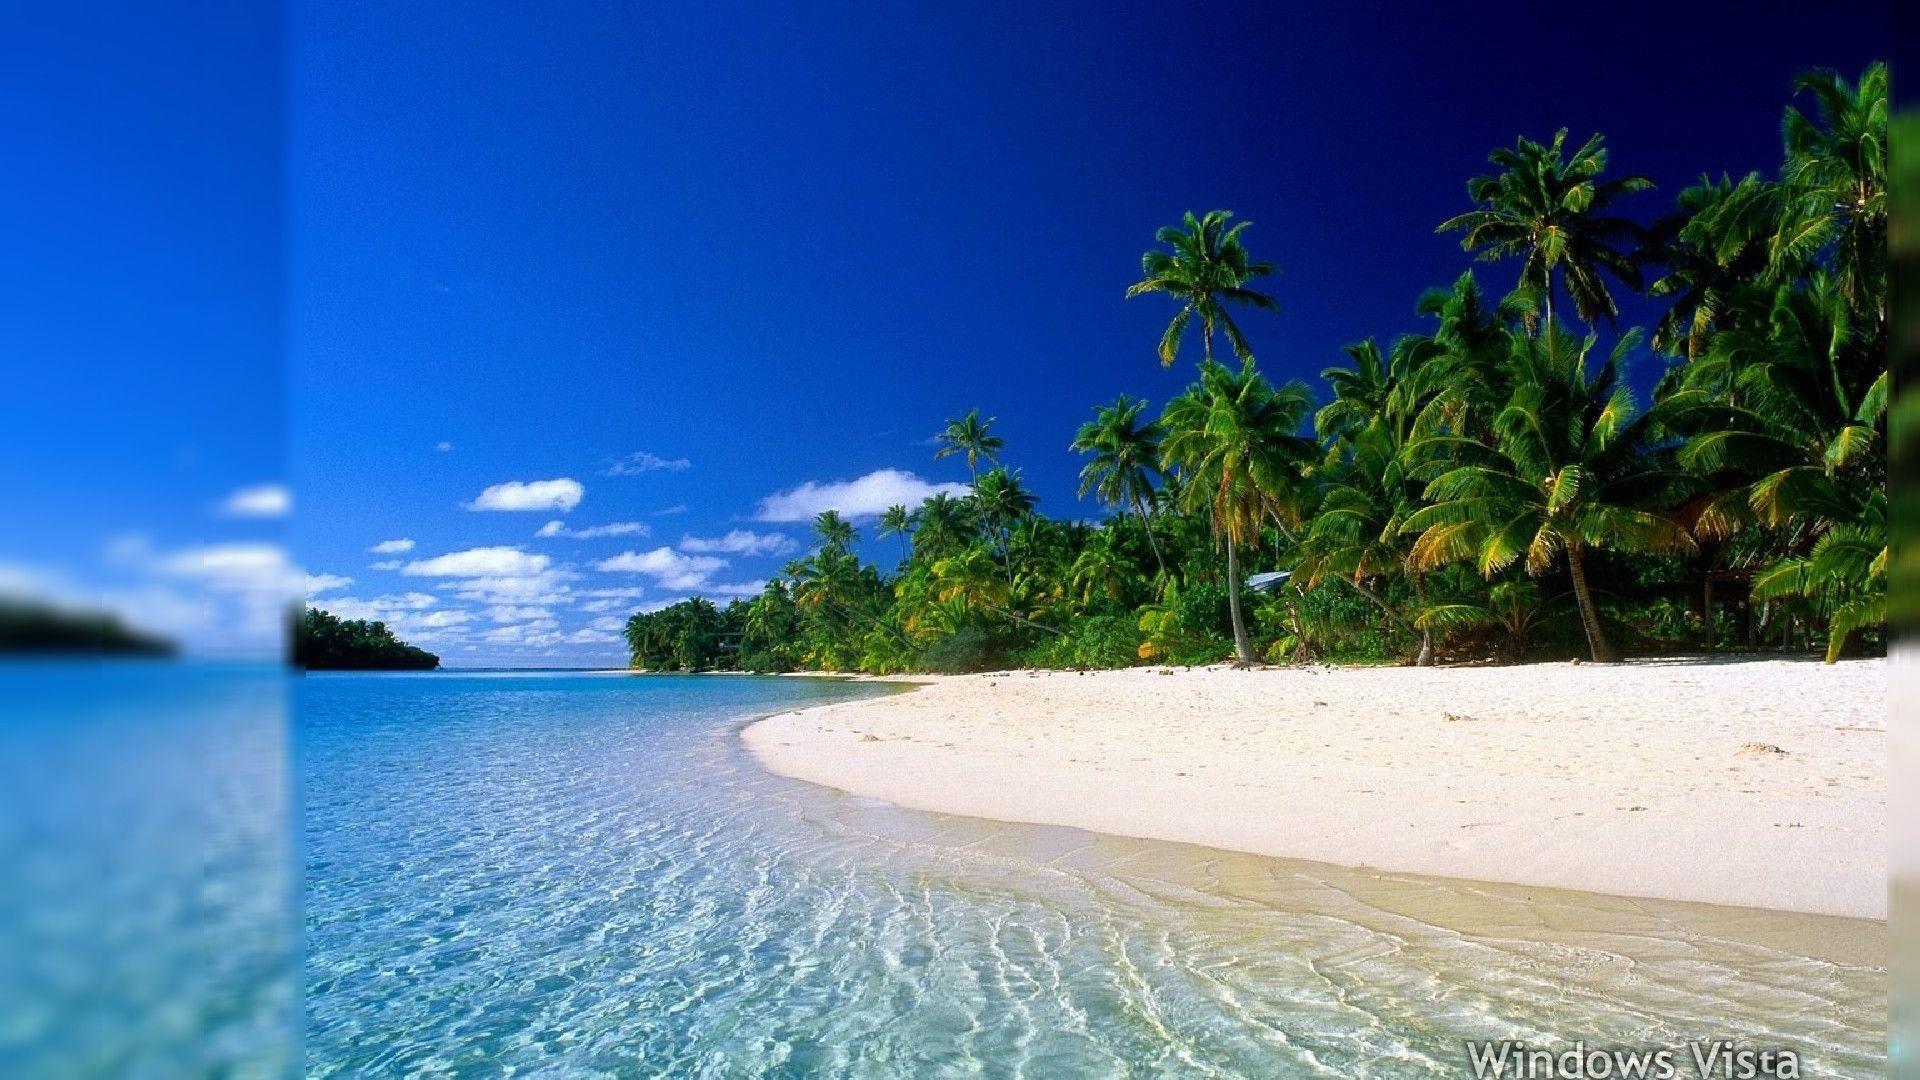 Hd Tropical Island Beach Paradise Wallpapers And Backgrounds: Tropical Desktop Wallpapers